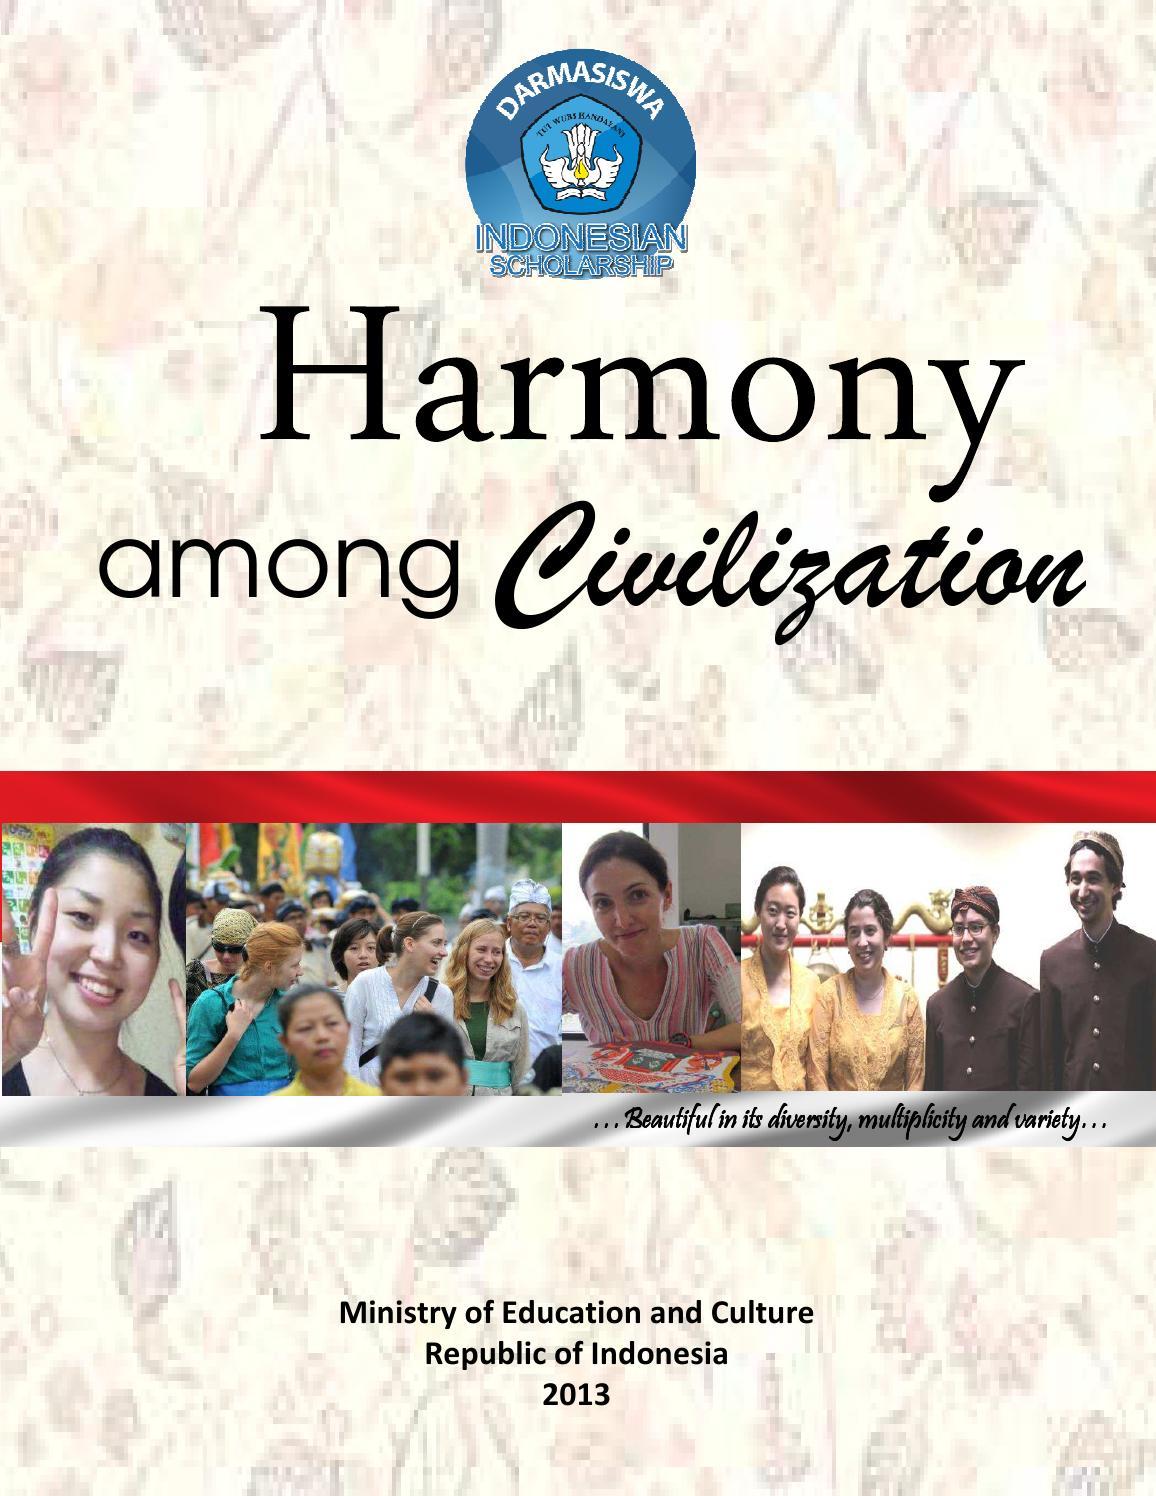 Harmony among civilization by Darmasiswa - issuu a2a4f907cf